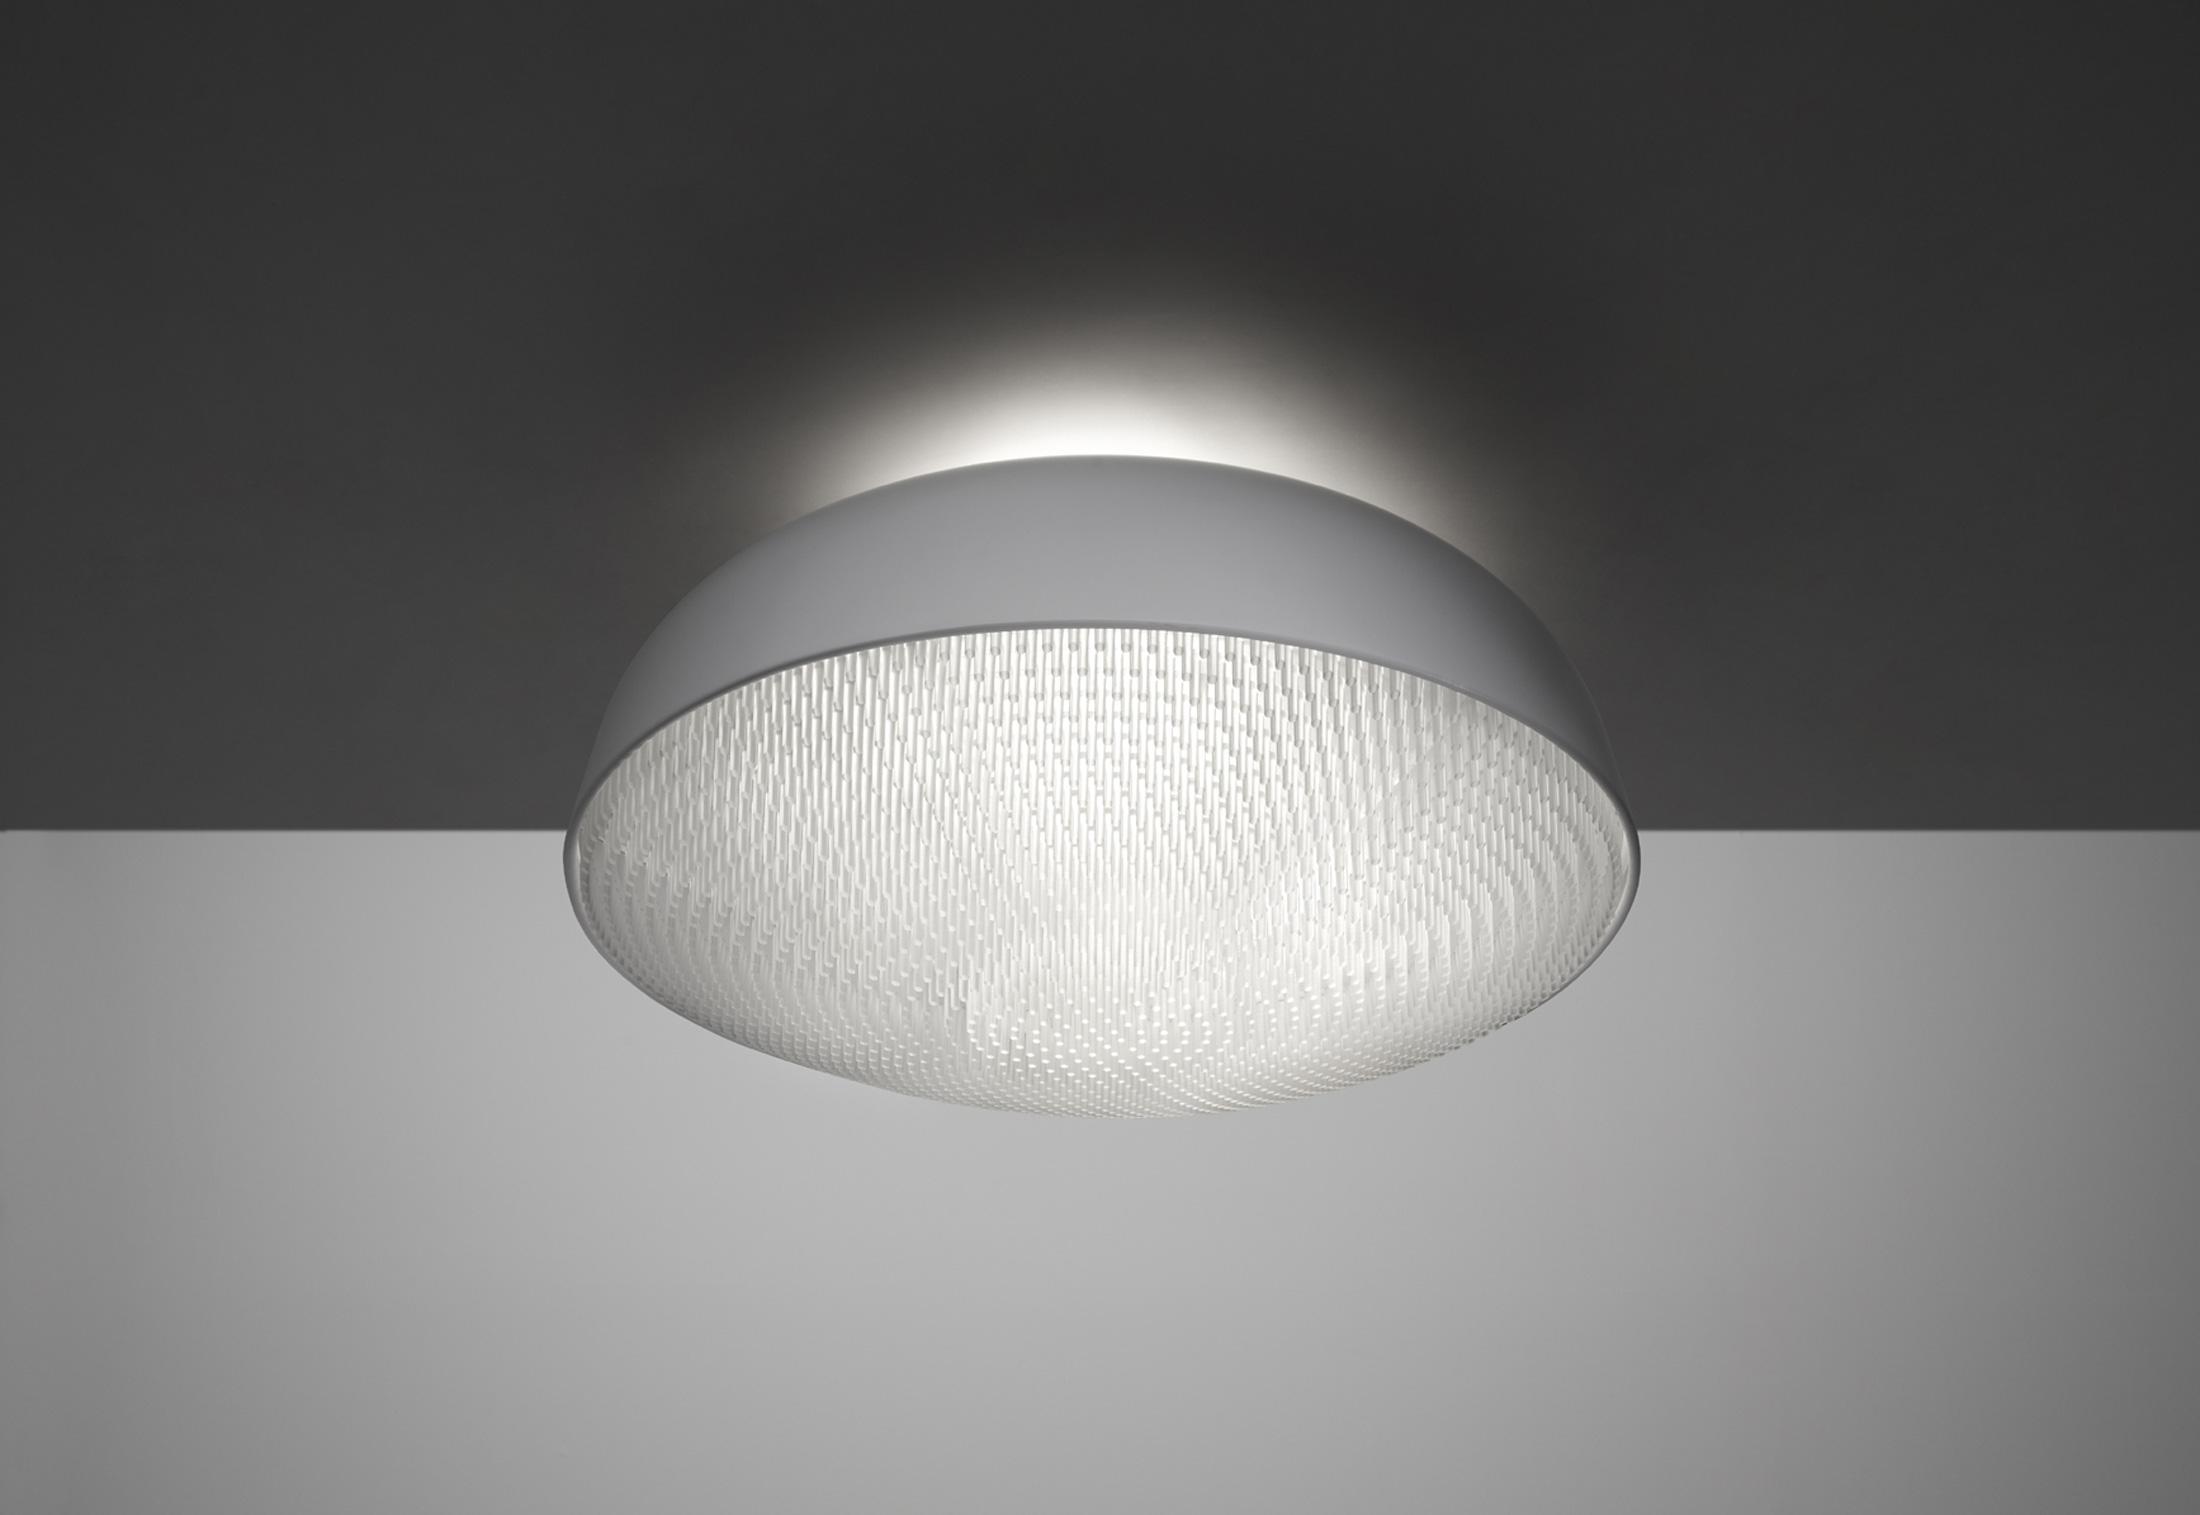 Spilli suspension lamp di Artemide   Lampadari   Illuminazione   Mollura Home Design -> Lampadari Artemide Sospensione